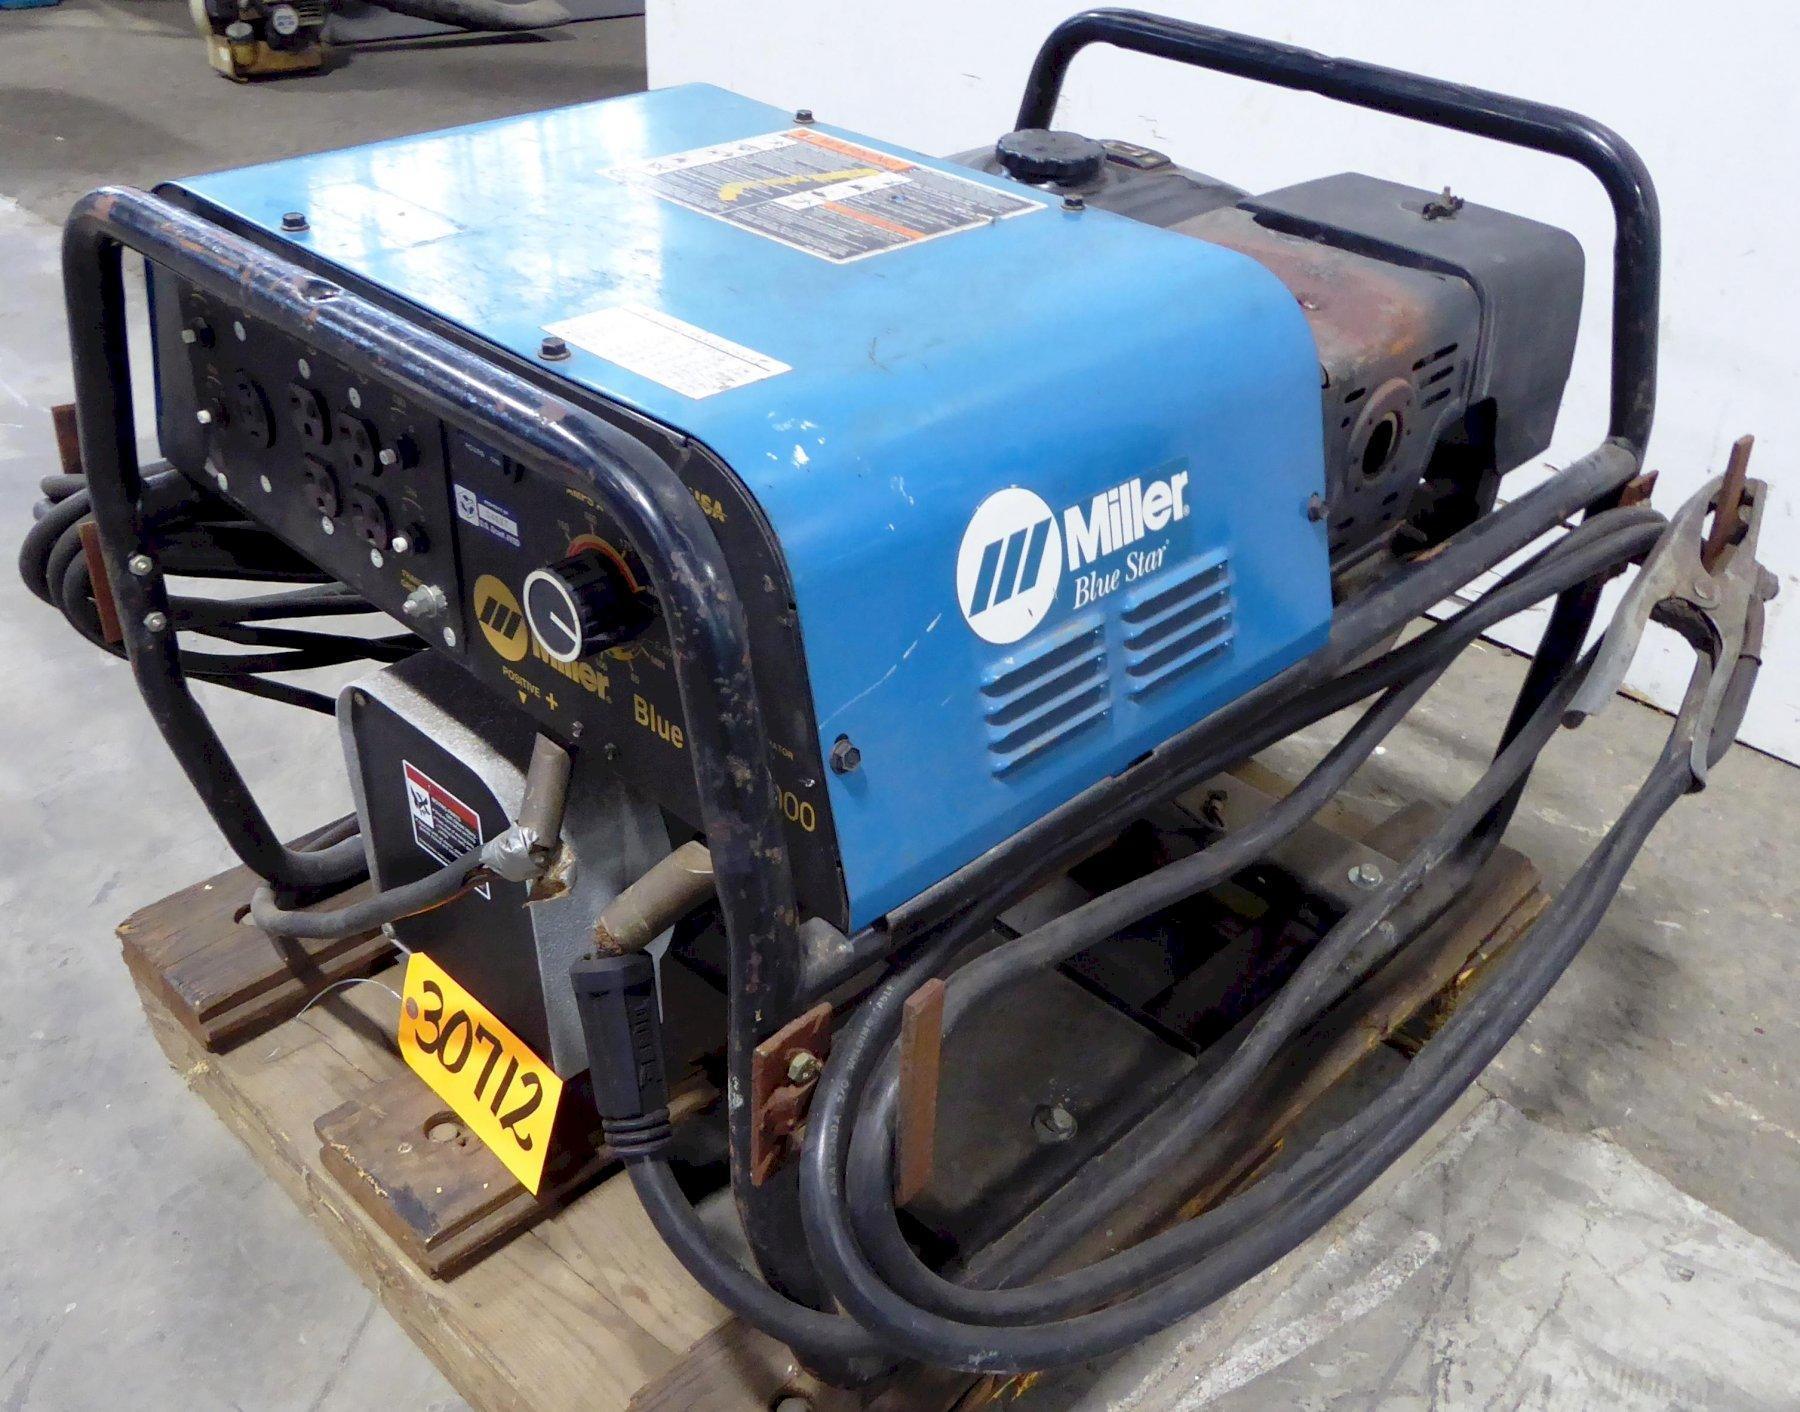 Miller Blue Star 6000, 180 Amp, 6000 Watt, Portable, Gasoline Engine Driven Welding Generator, 13 HP Honda GX390 Engine